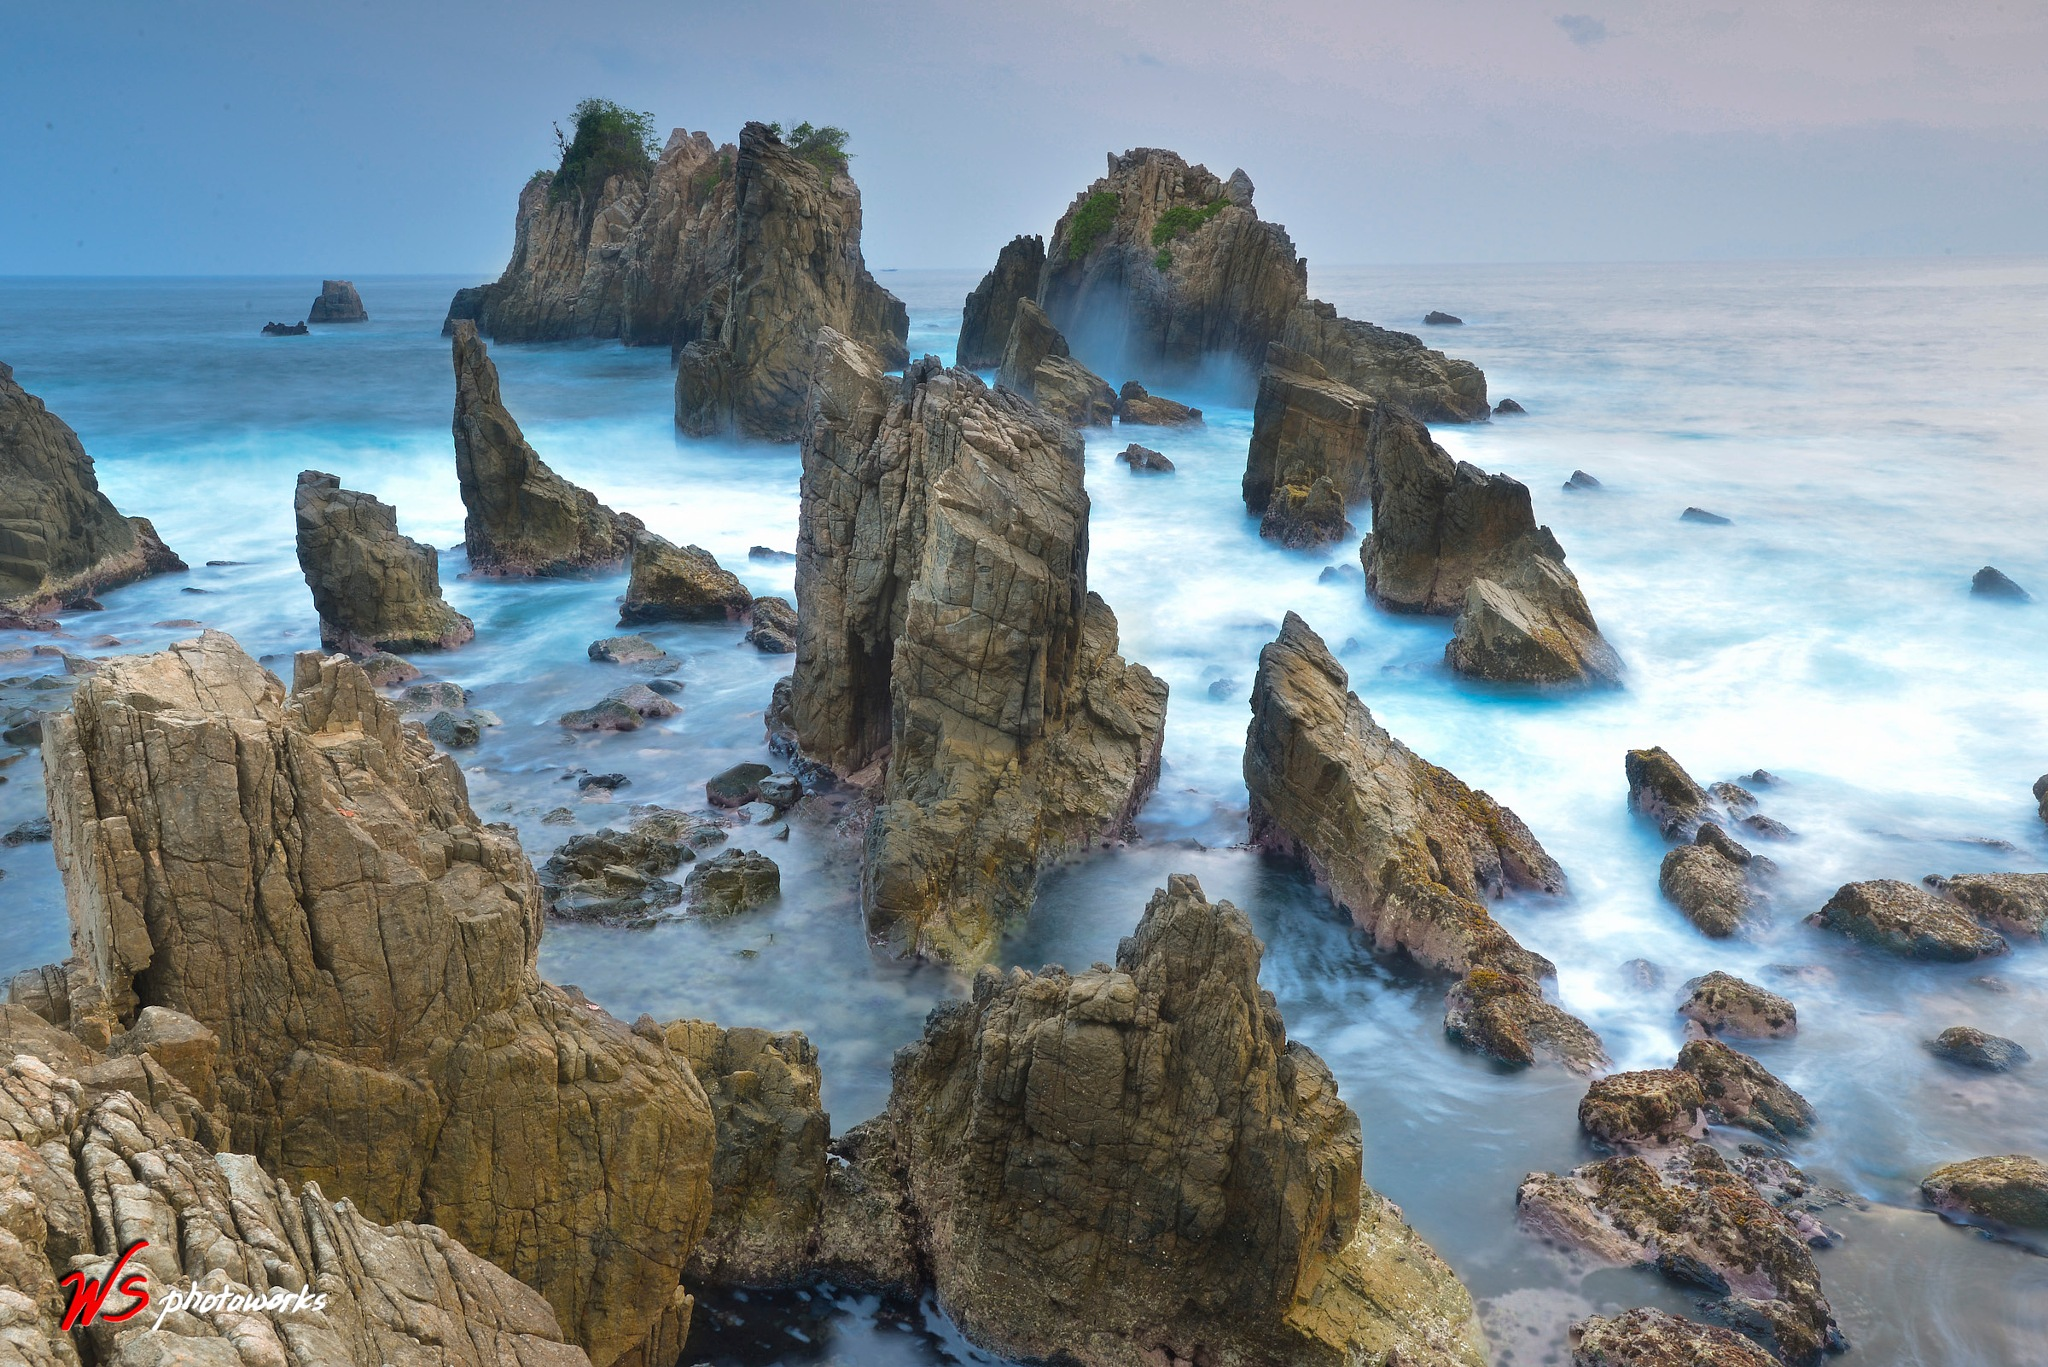 Waves at the rocky beach of Pegadung, Lampung by wahyusur